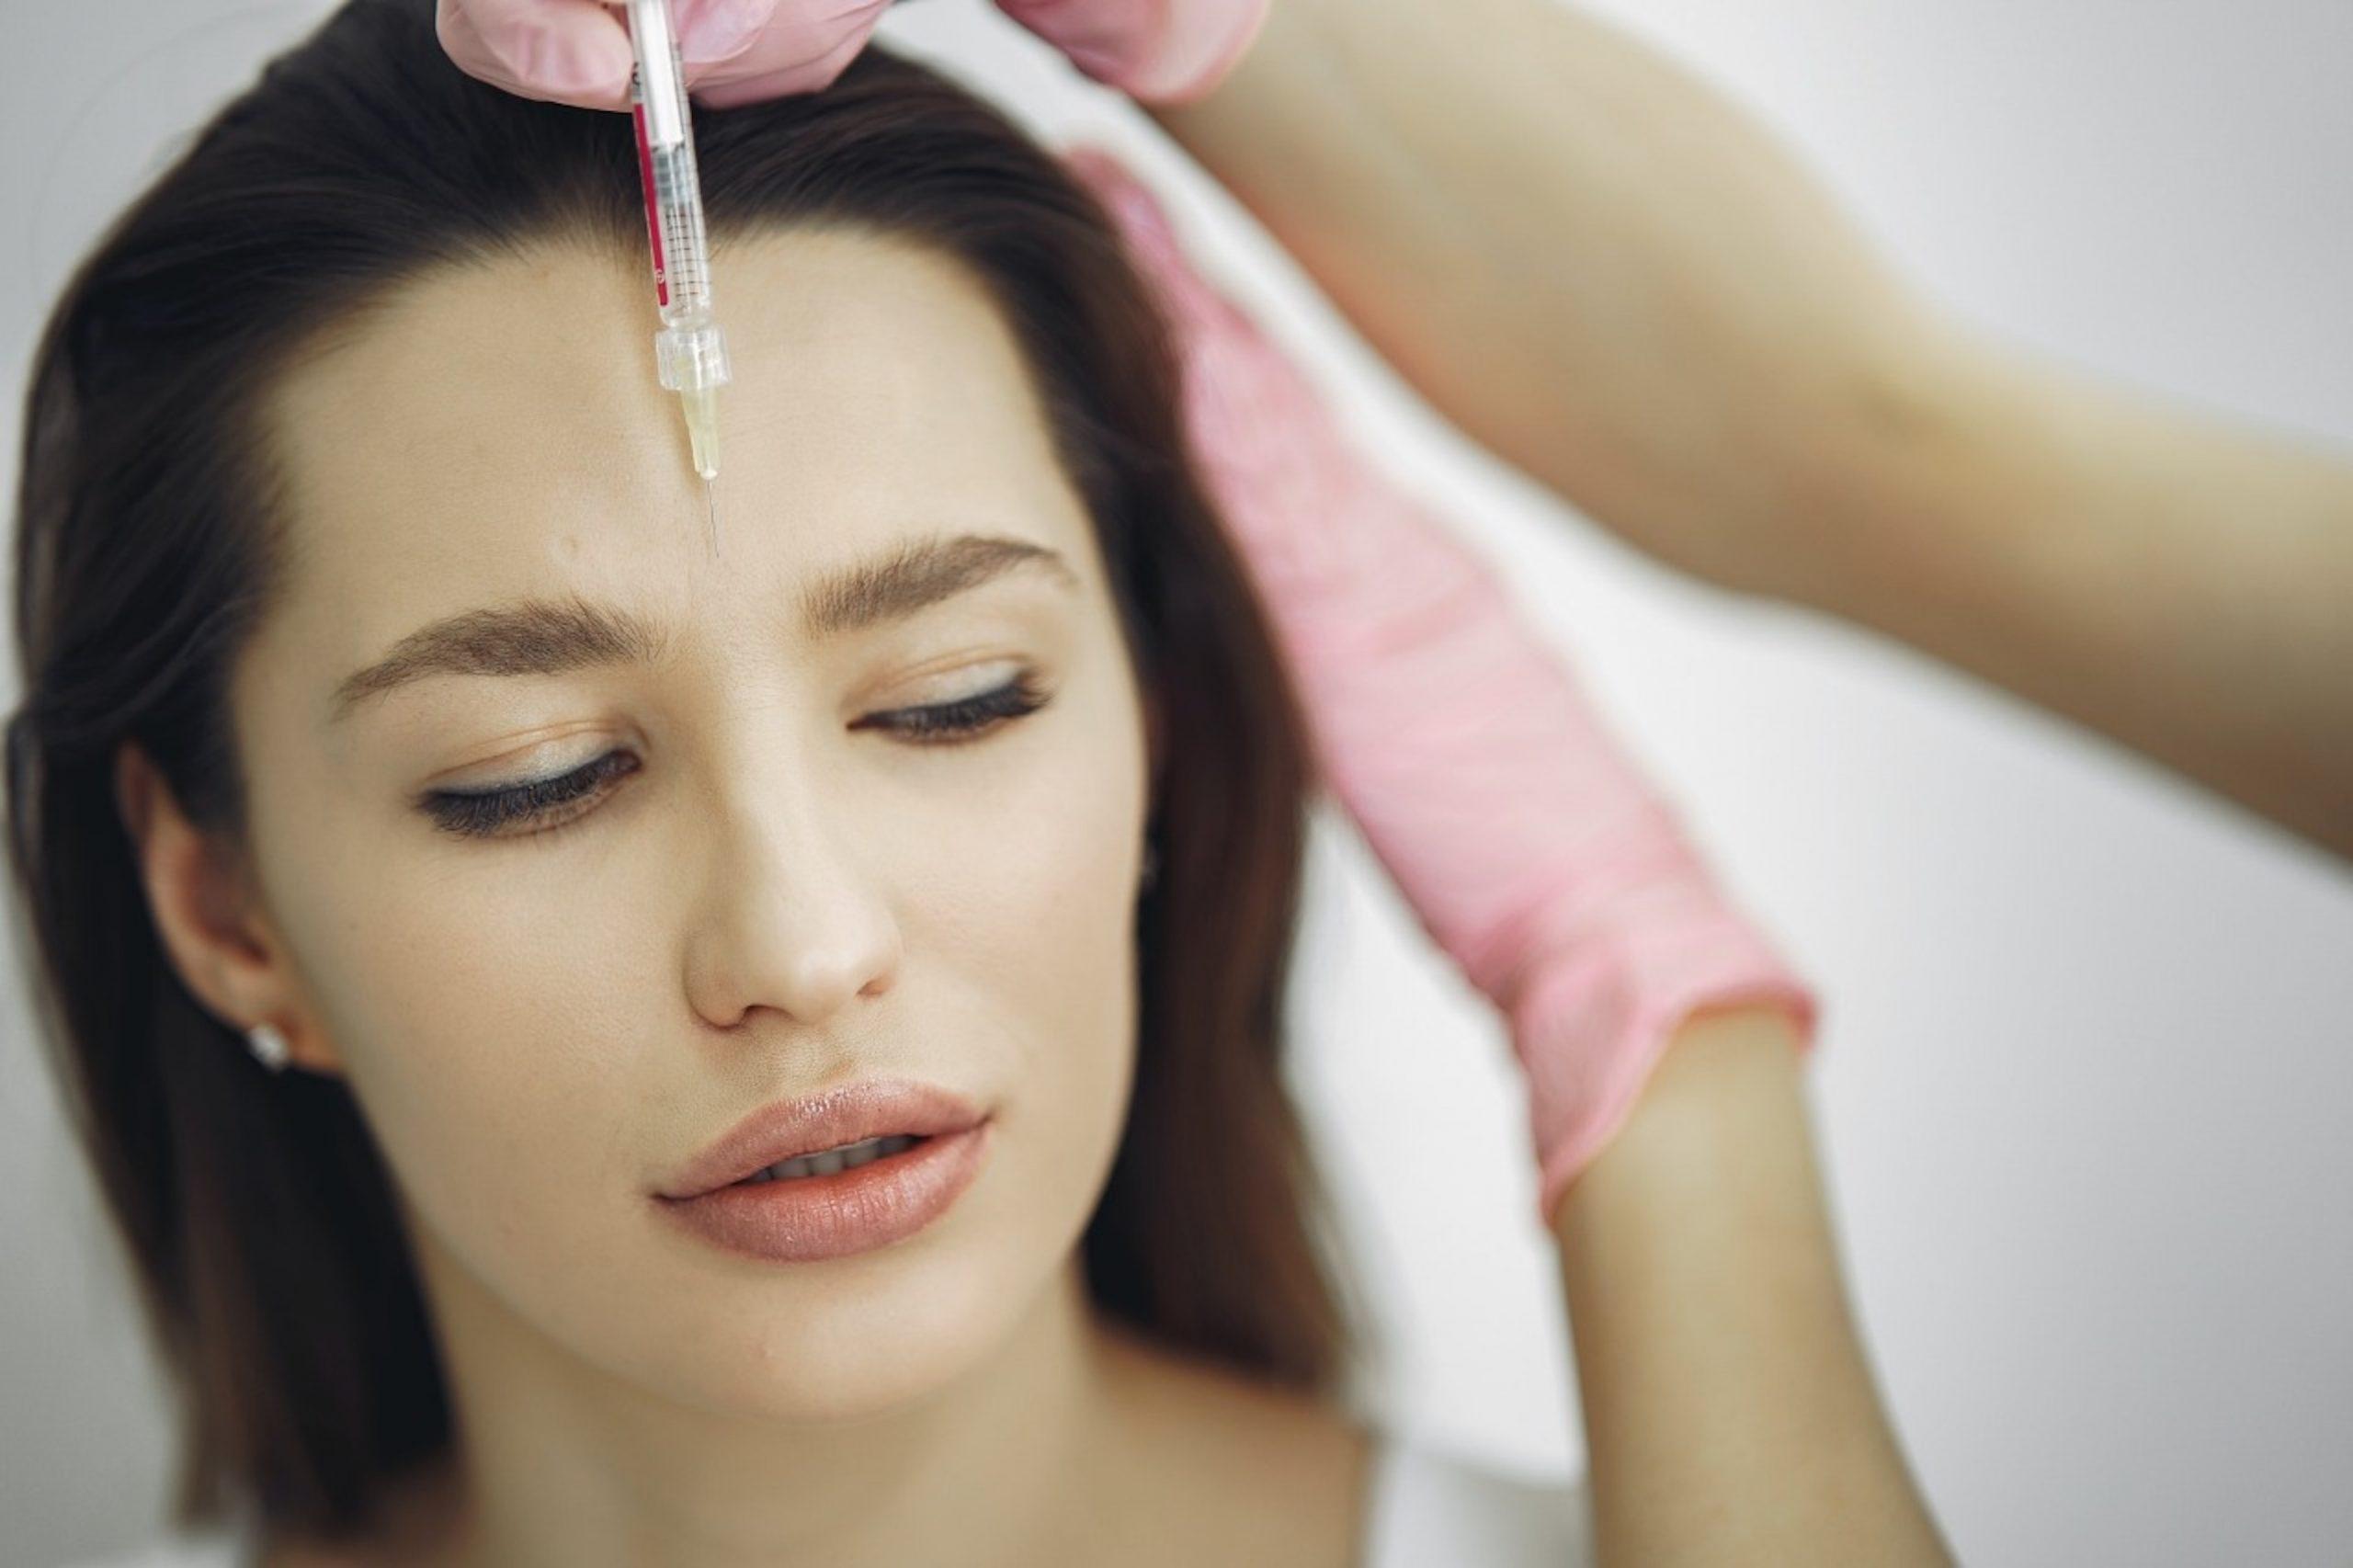 Rejuvenescimento Facial: Cirurgião Plástico Luiz Haroldo Pereira explica a diferença entre Lifting Facial, Botox ePreenchimento